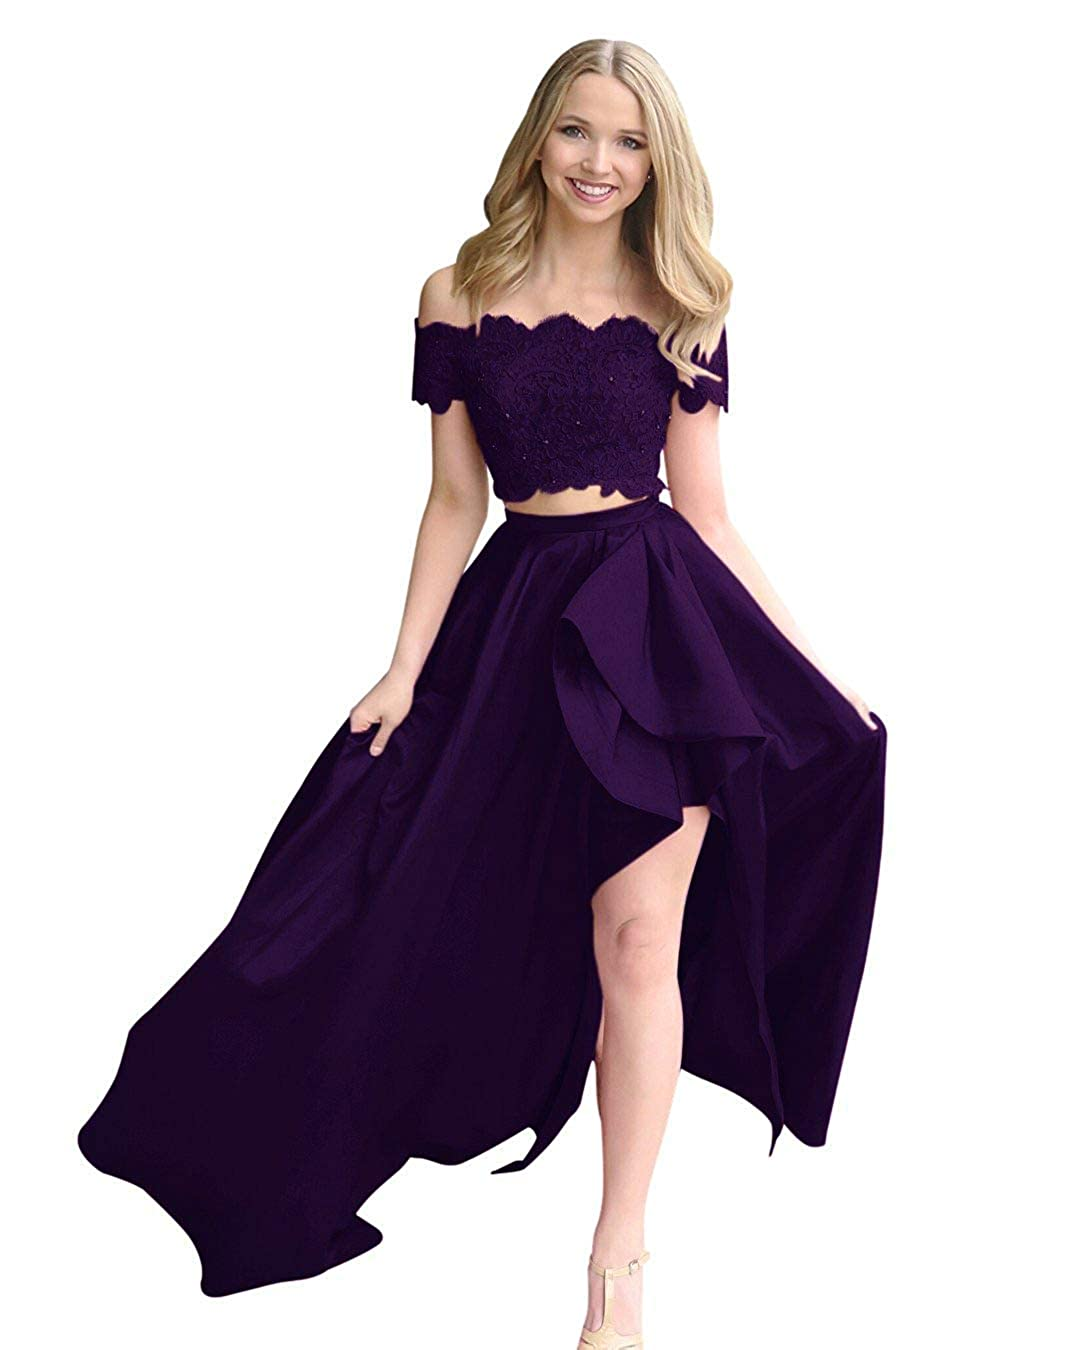 Grape Fanciest Women's Two Pieces Lace Prom Dresses Long Formal Evening Party Dress